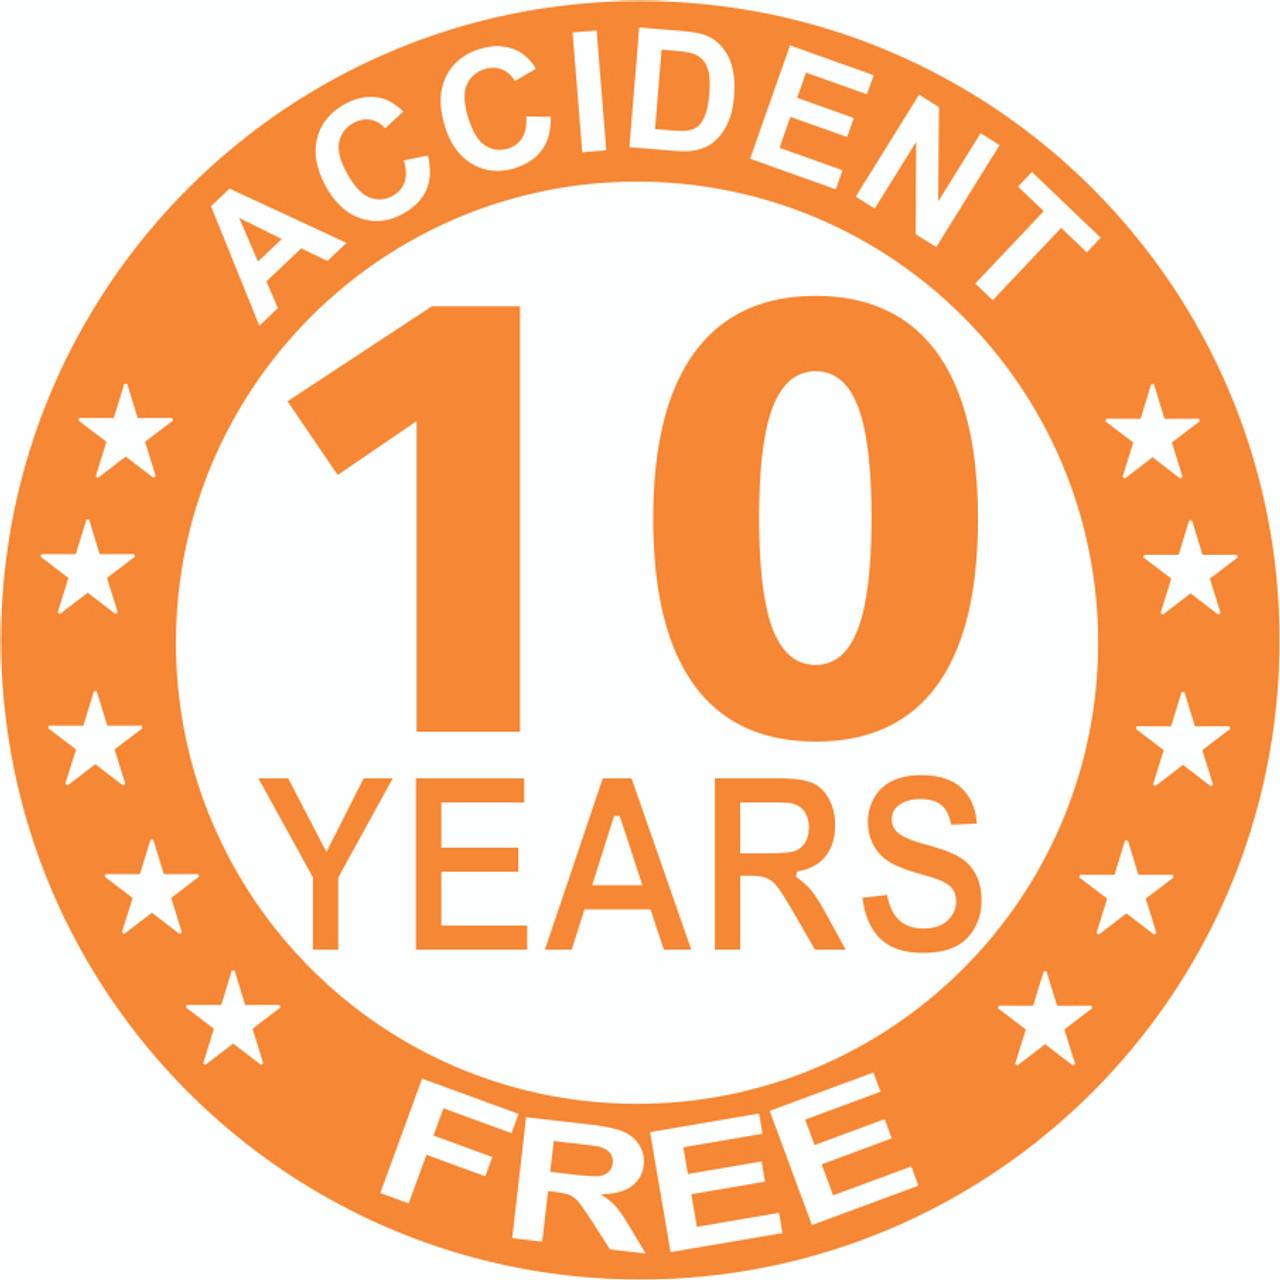 Accident Free 10 Years Hardhat Sticker